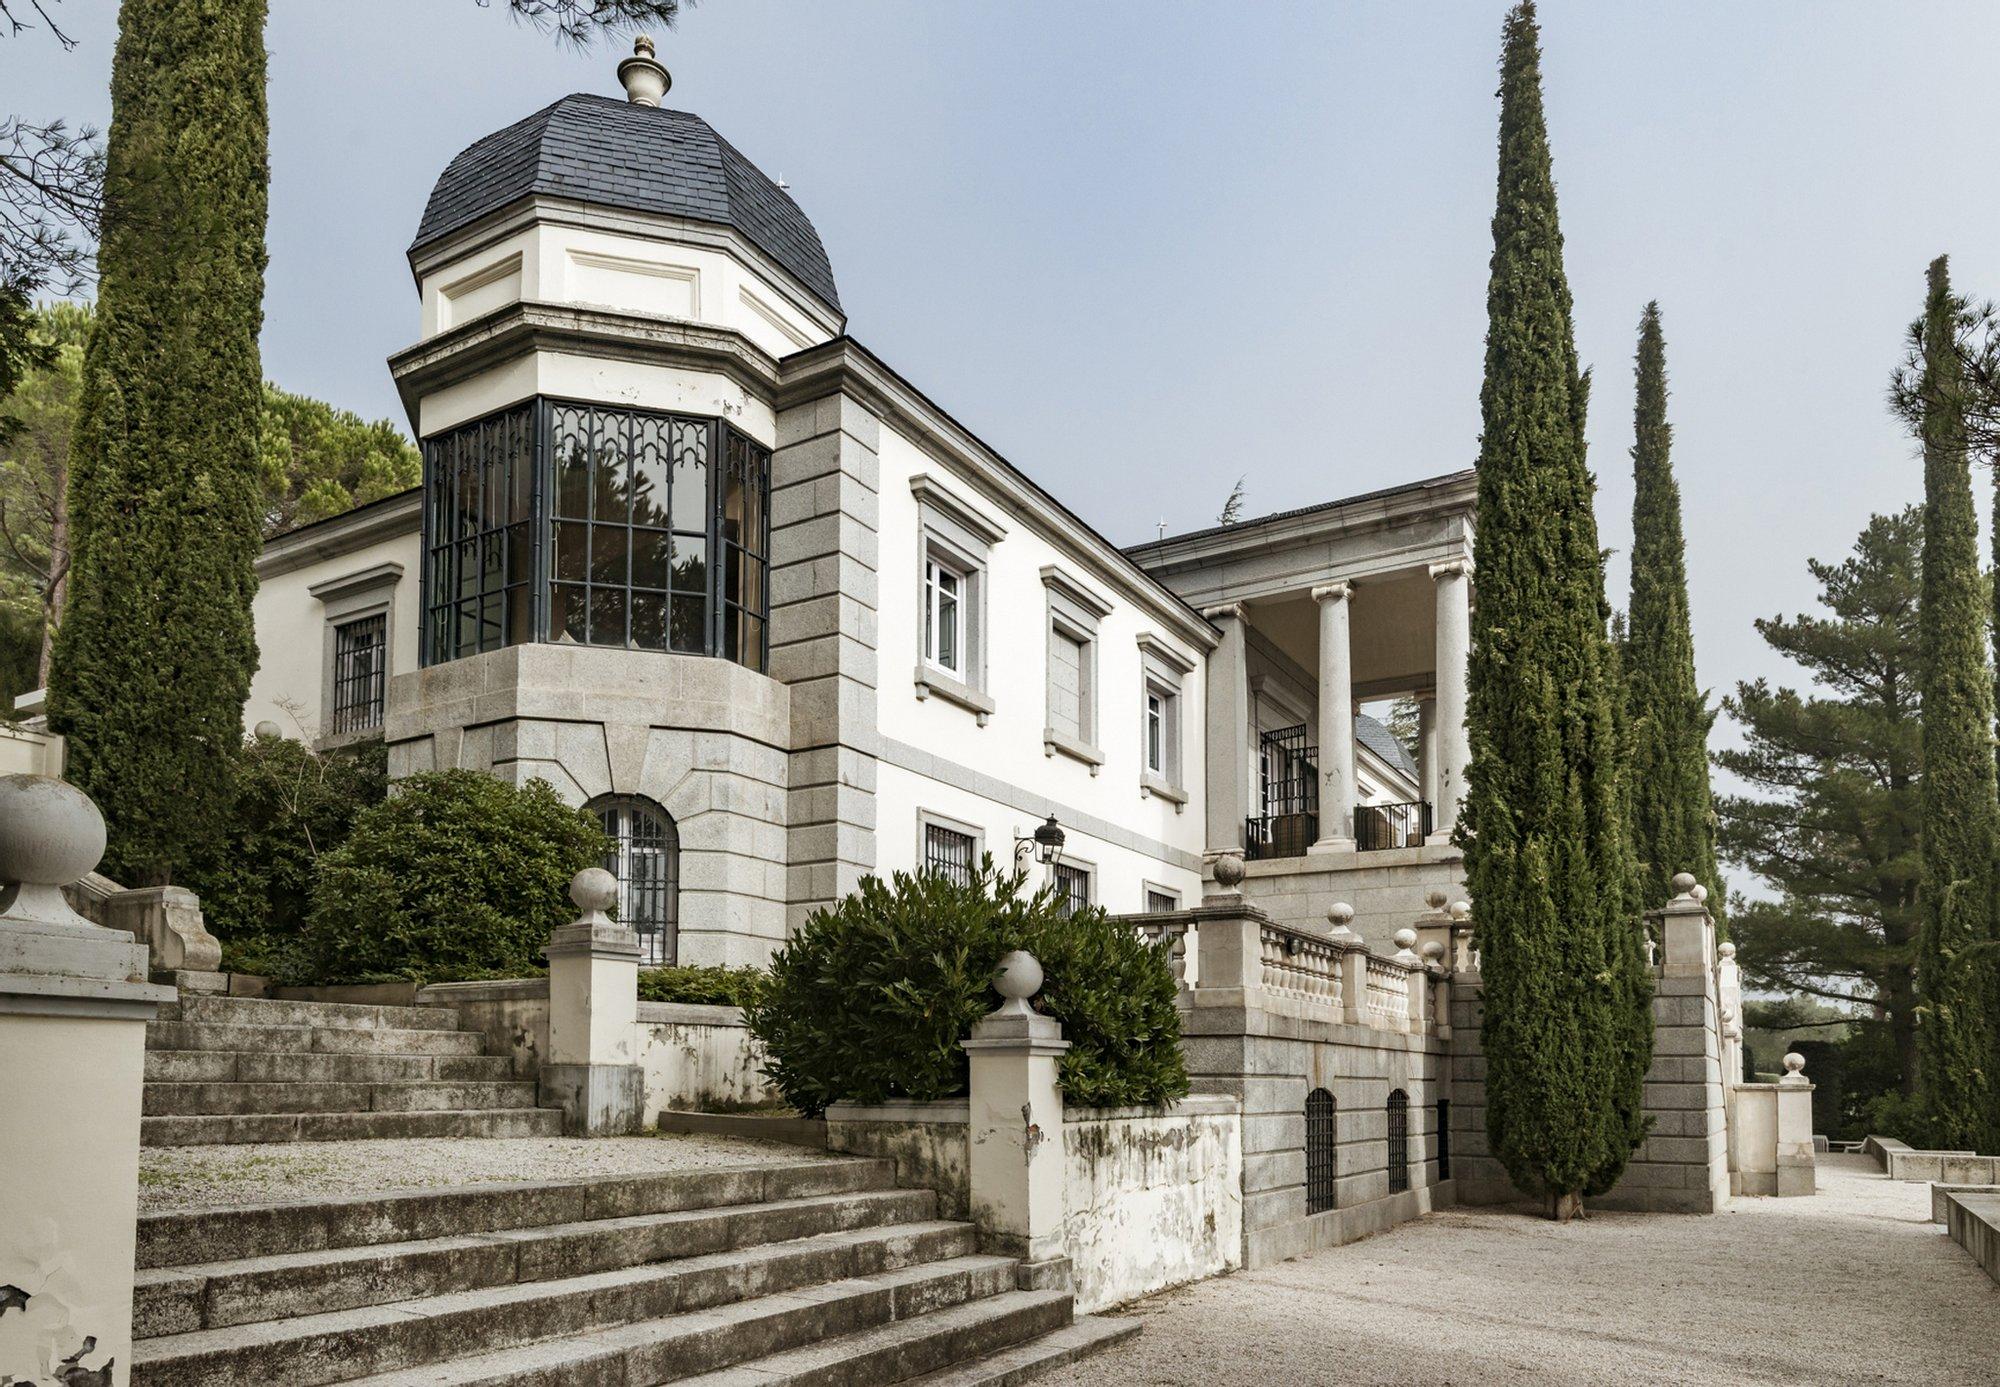 Community of Madrid, Spain 1